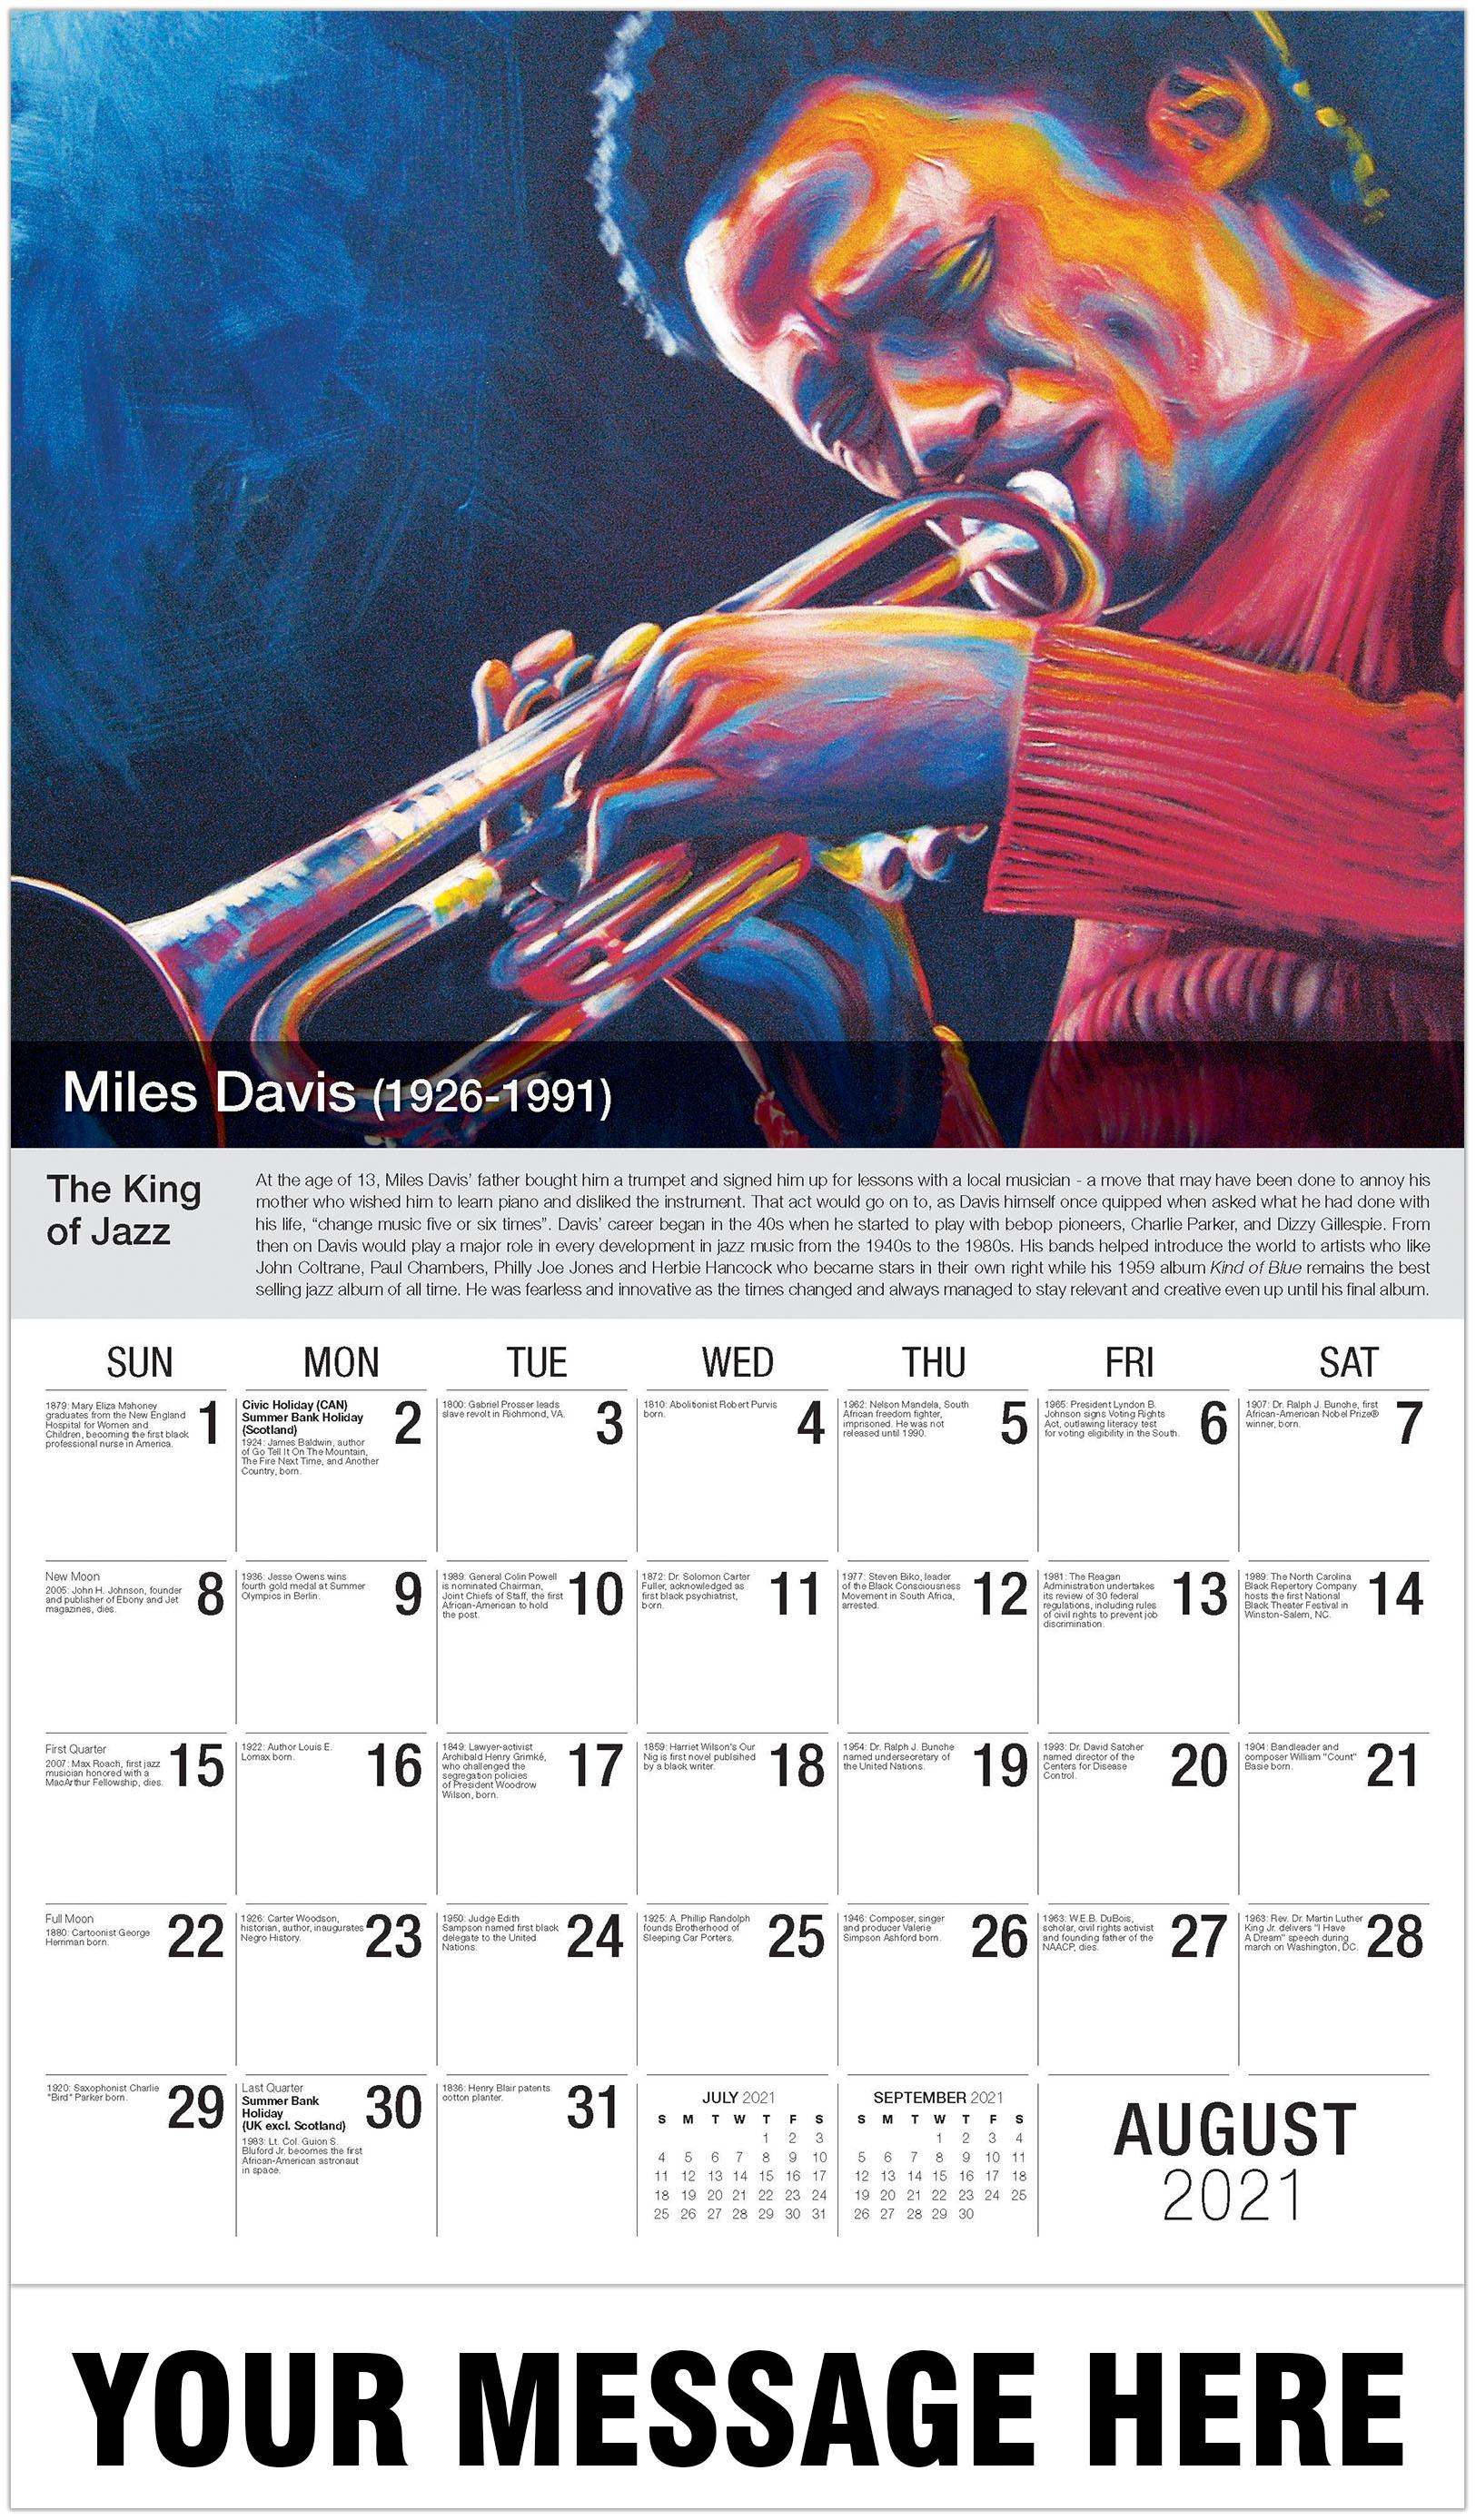 Miles Davis - August - Black History 2021 Promotional Calendar